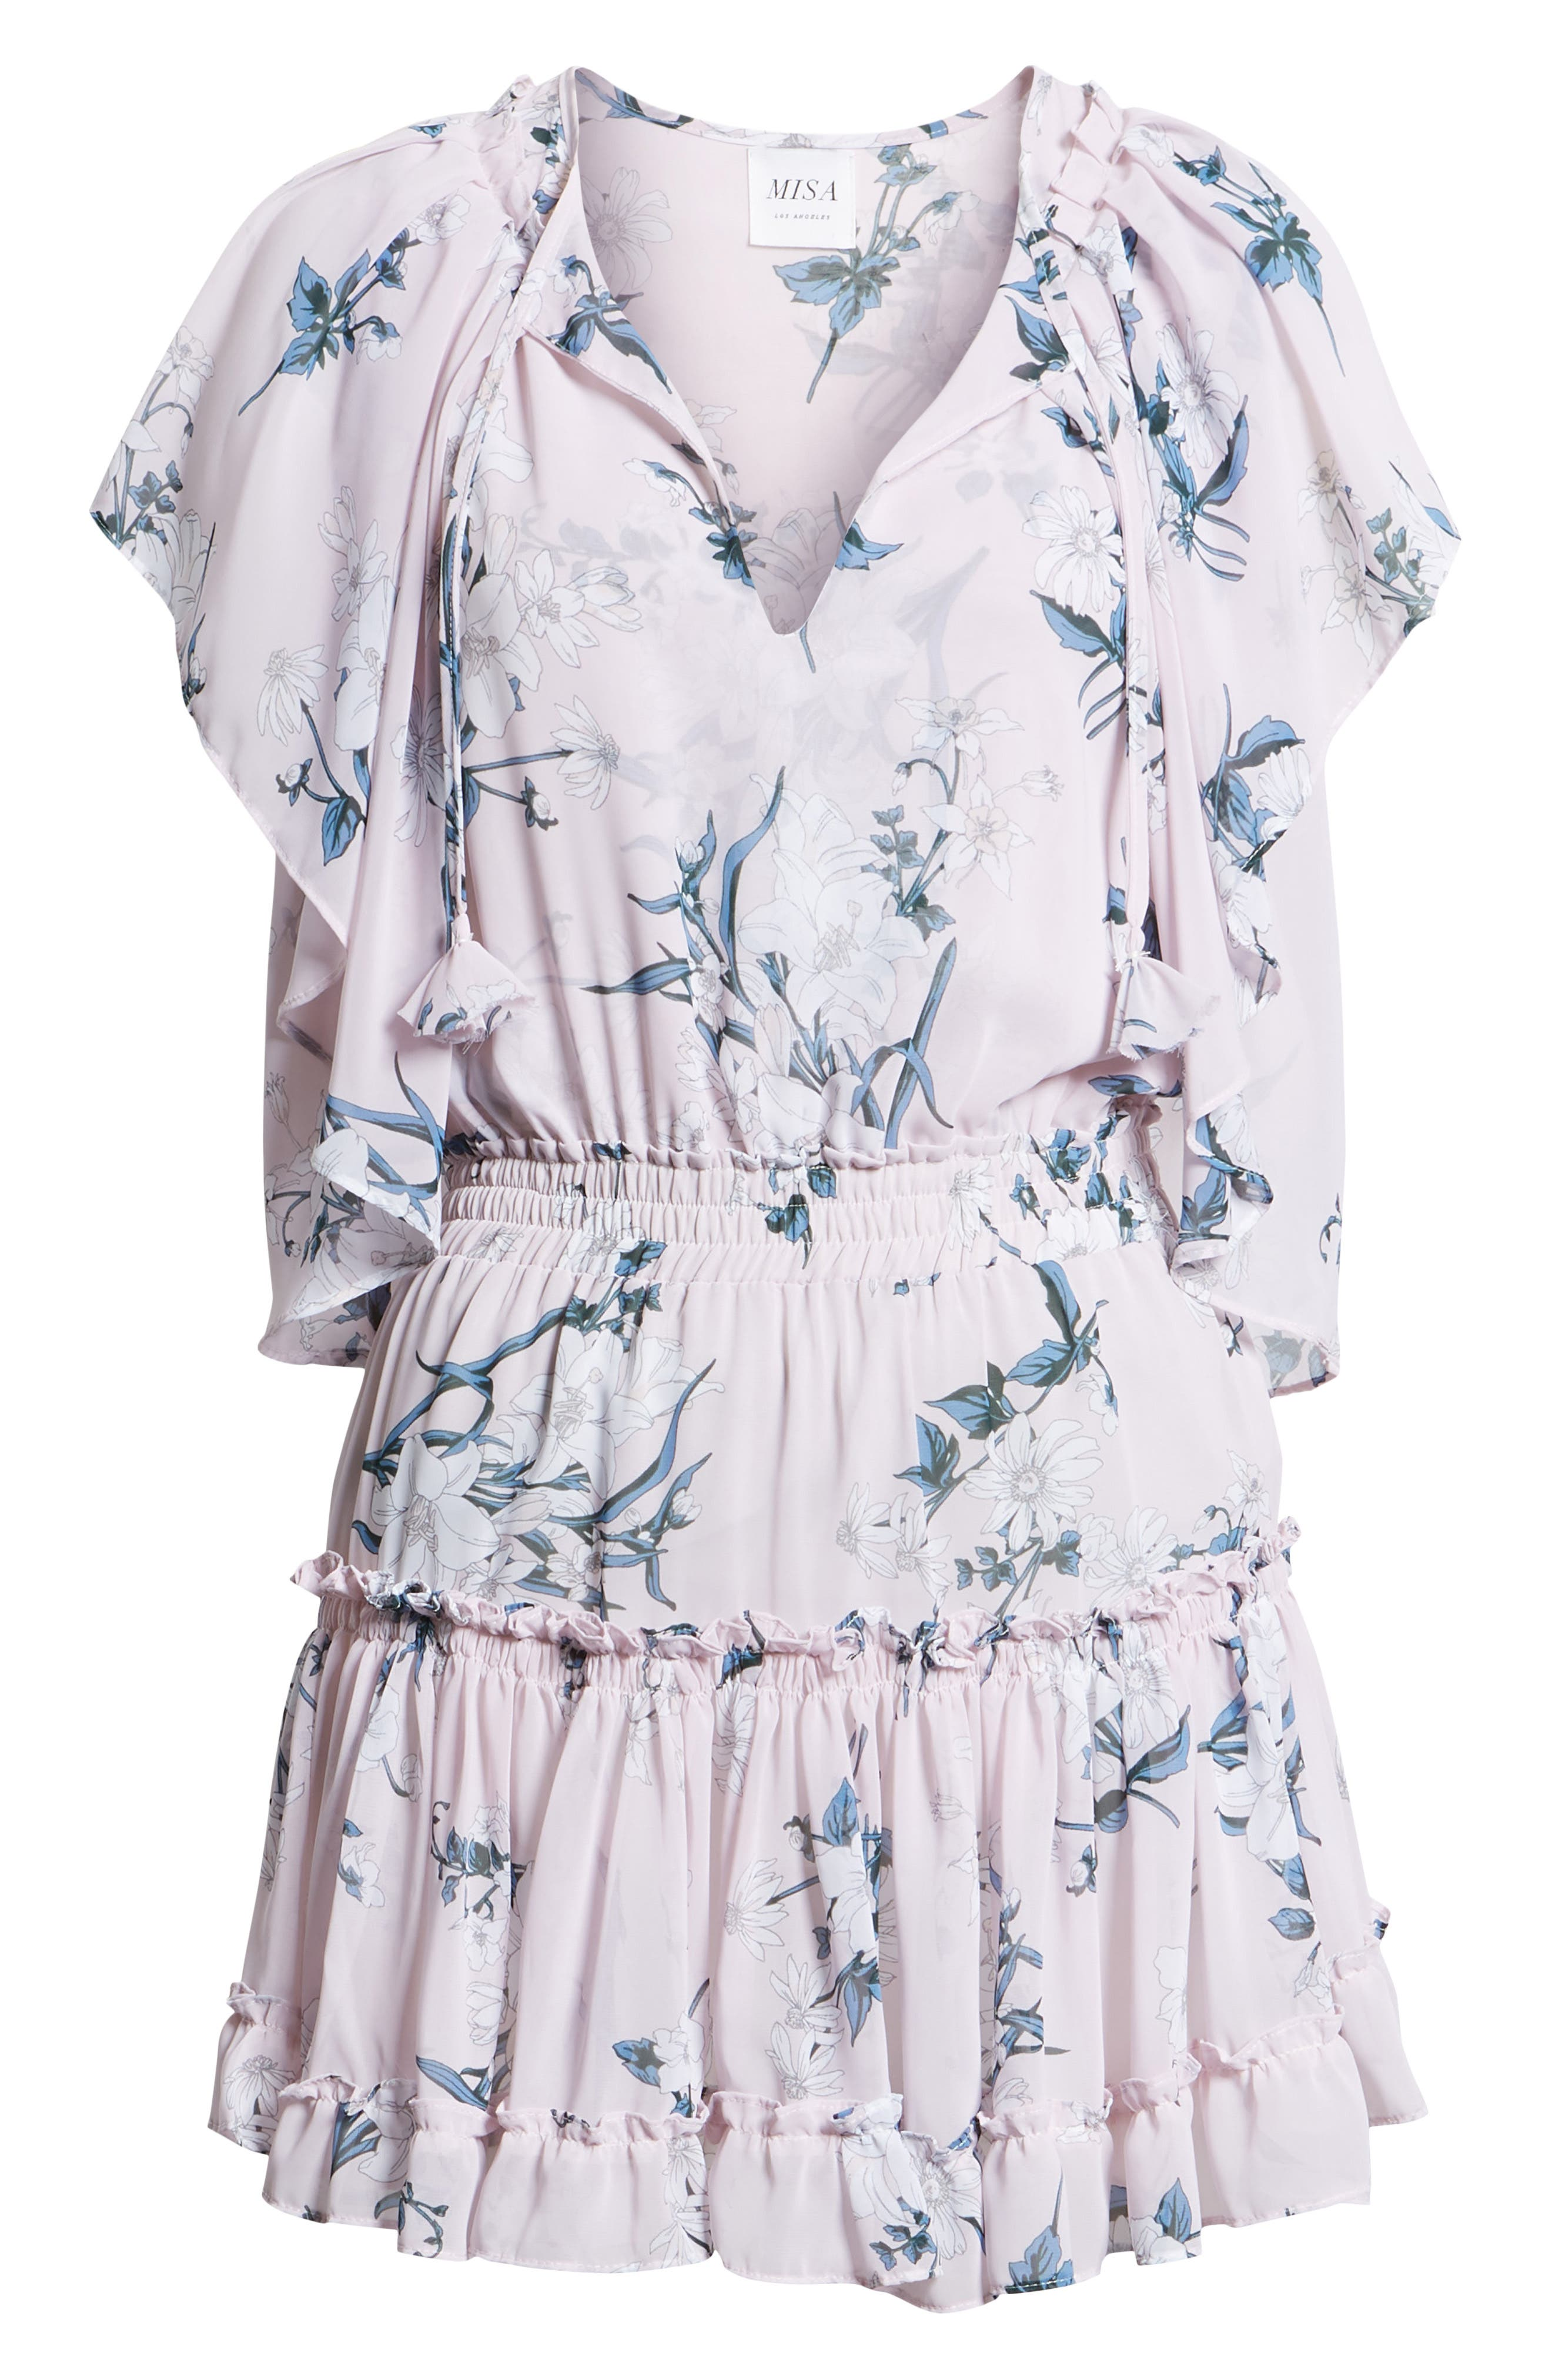 Lullu Dress,                             Alternate thumbnail 7, color,                             650